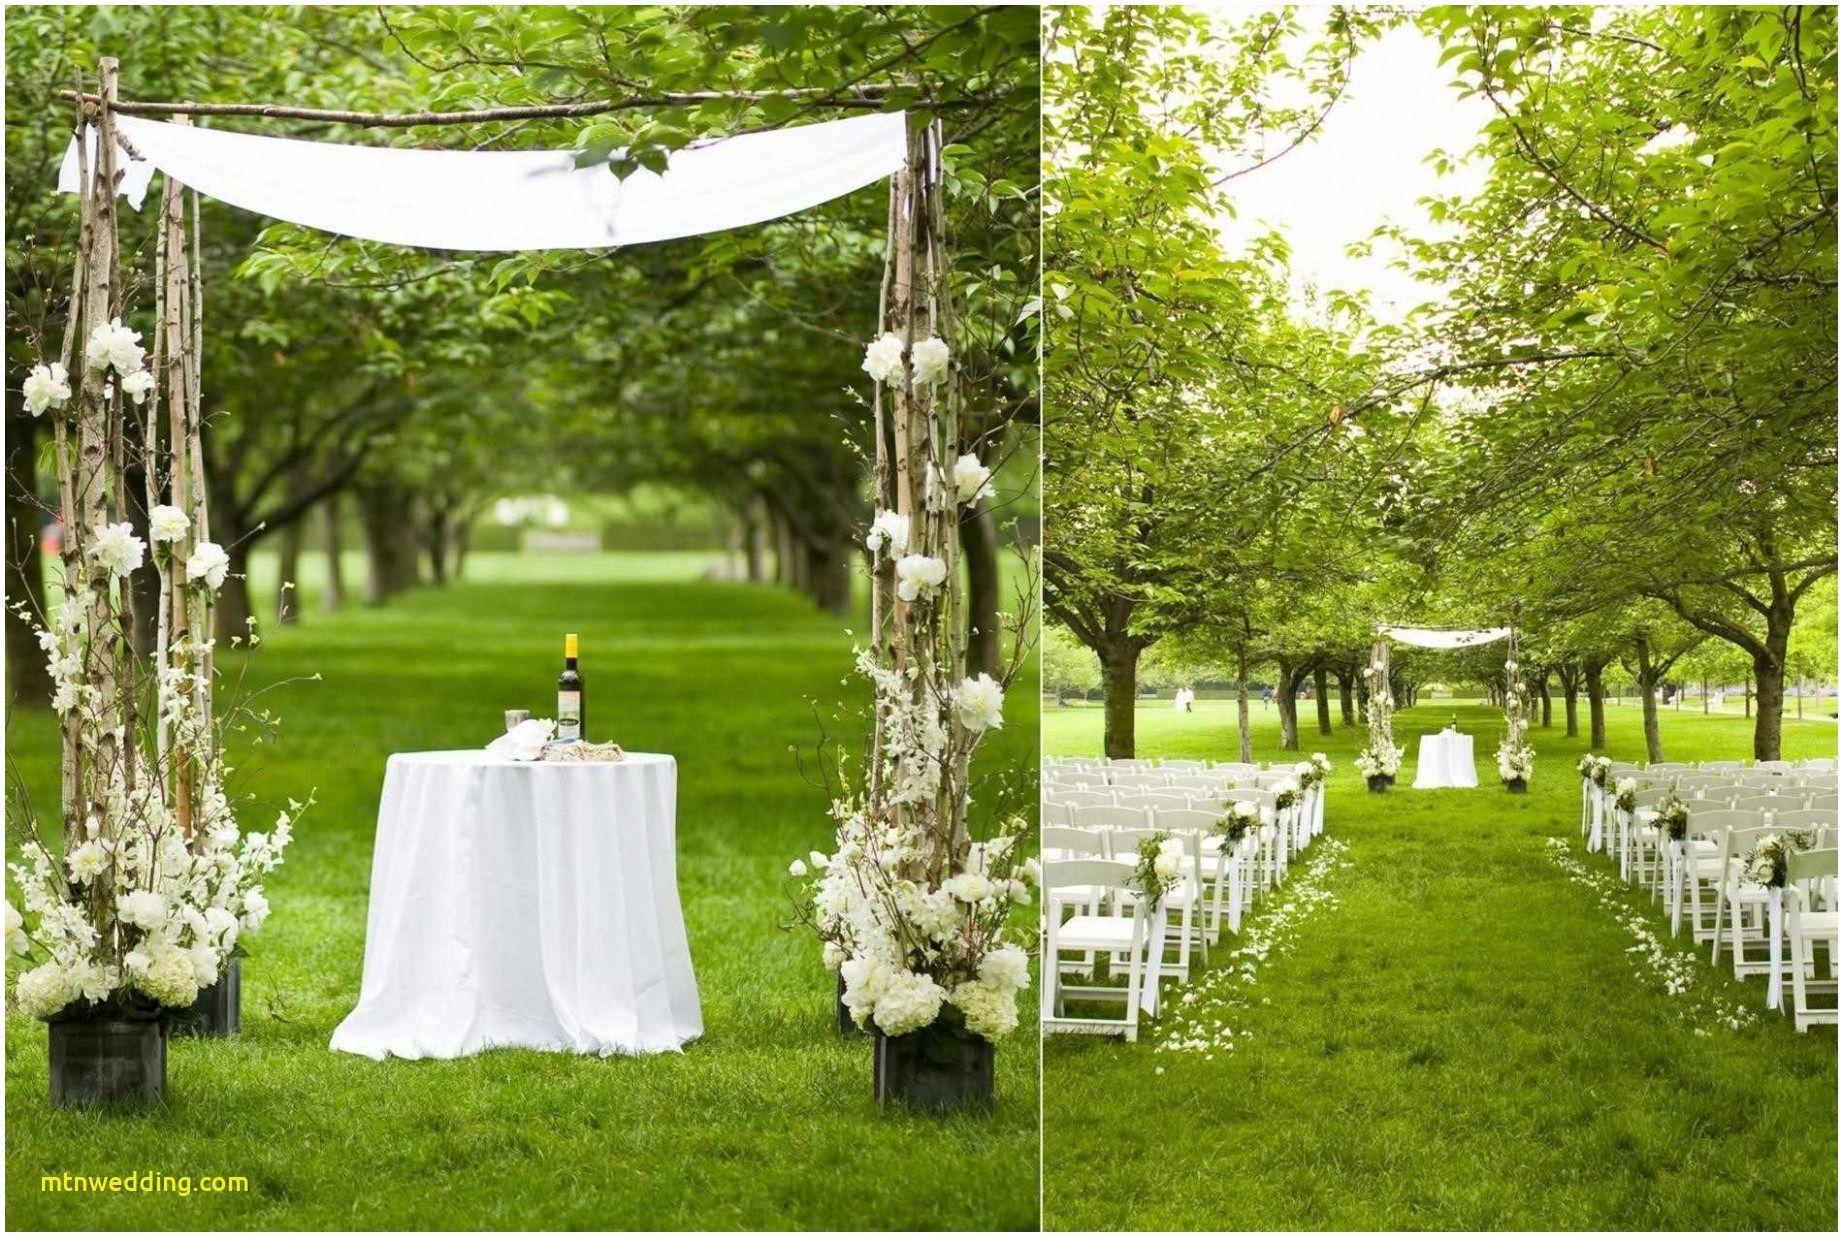 Best Of Simple Outdoor Wedding Decoration Ideas Cheap Wedding Reception Wedding Themes Outdoor Simple Wedding Venues